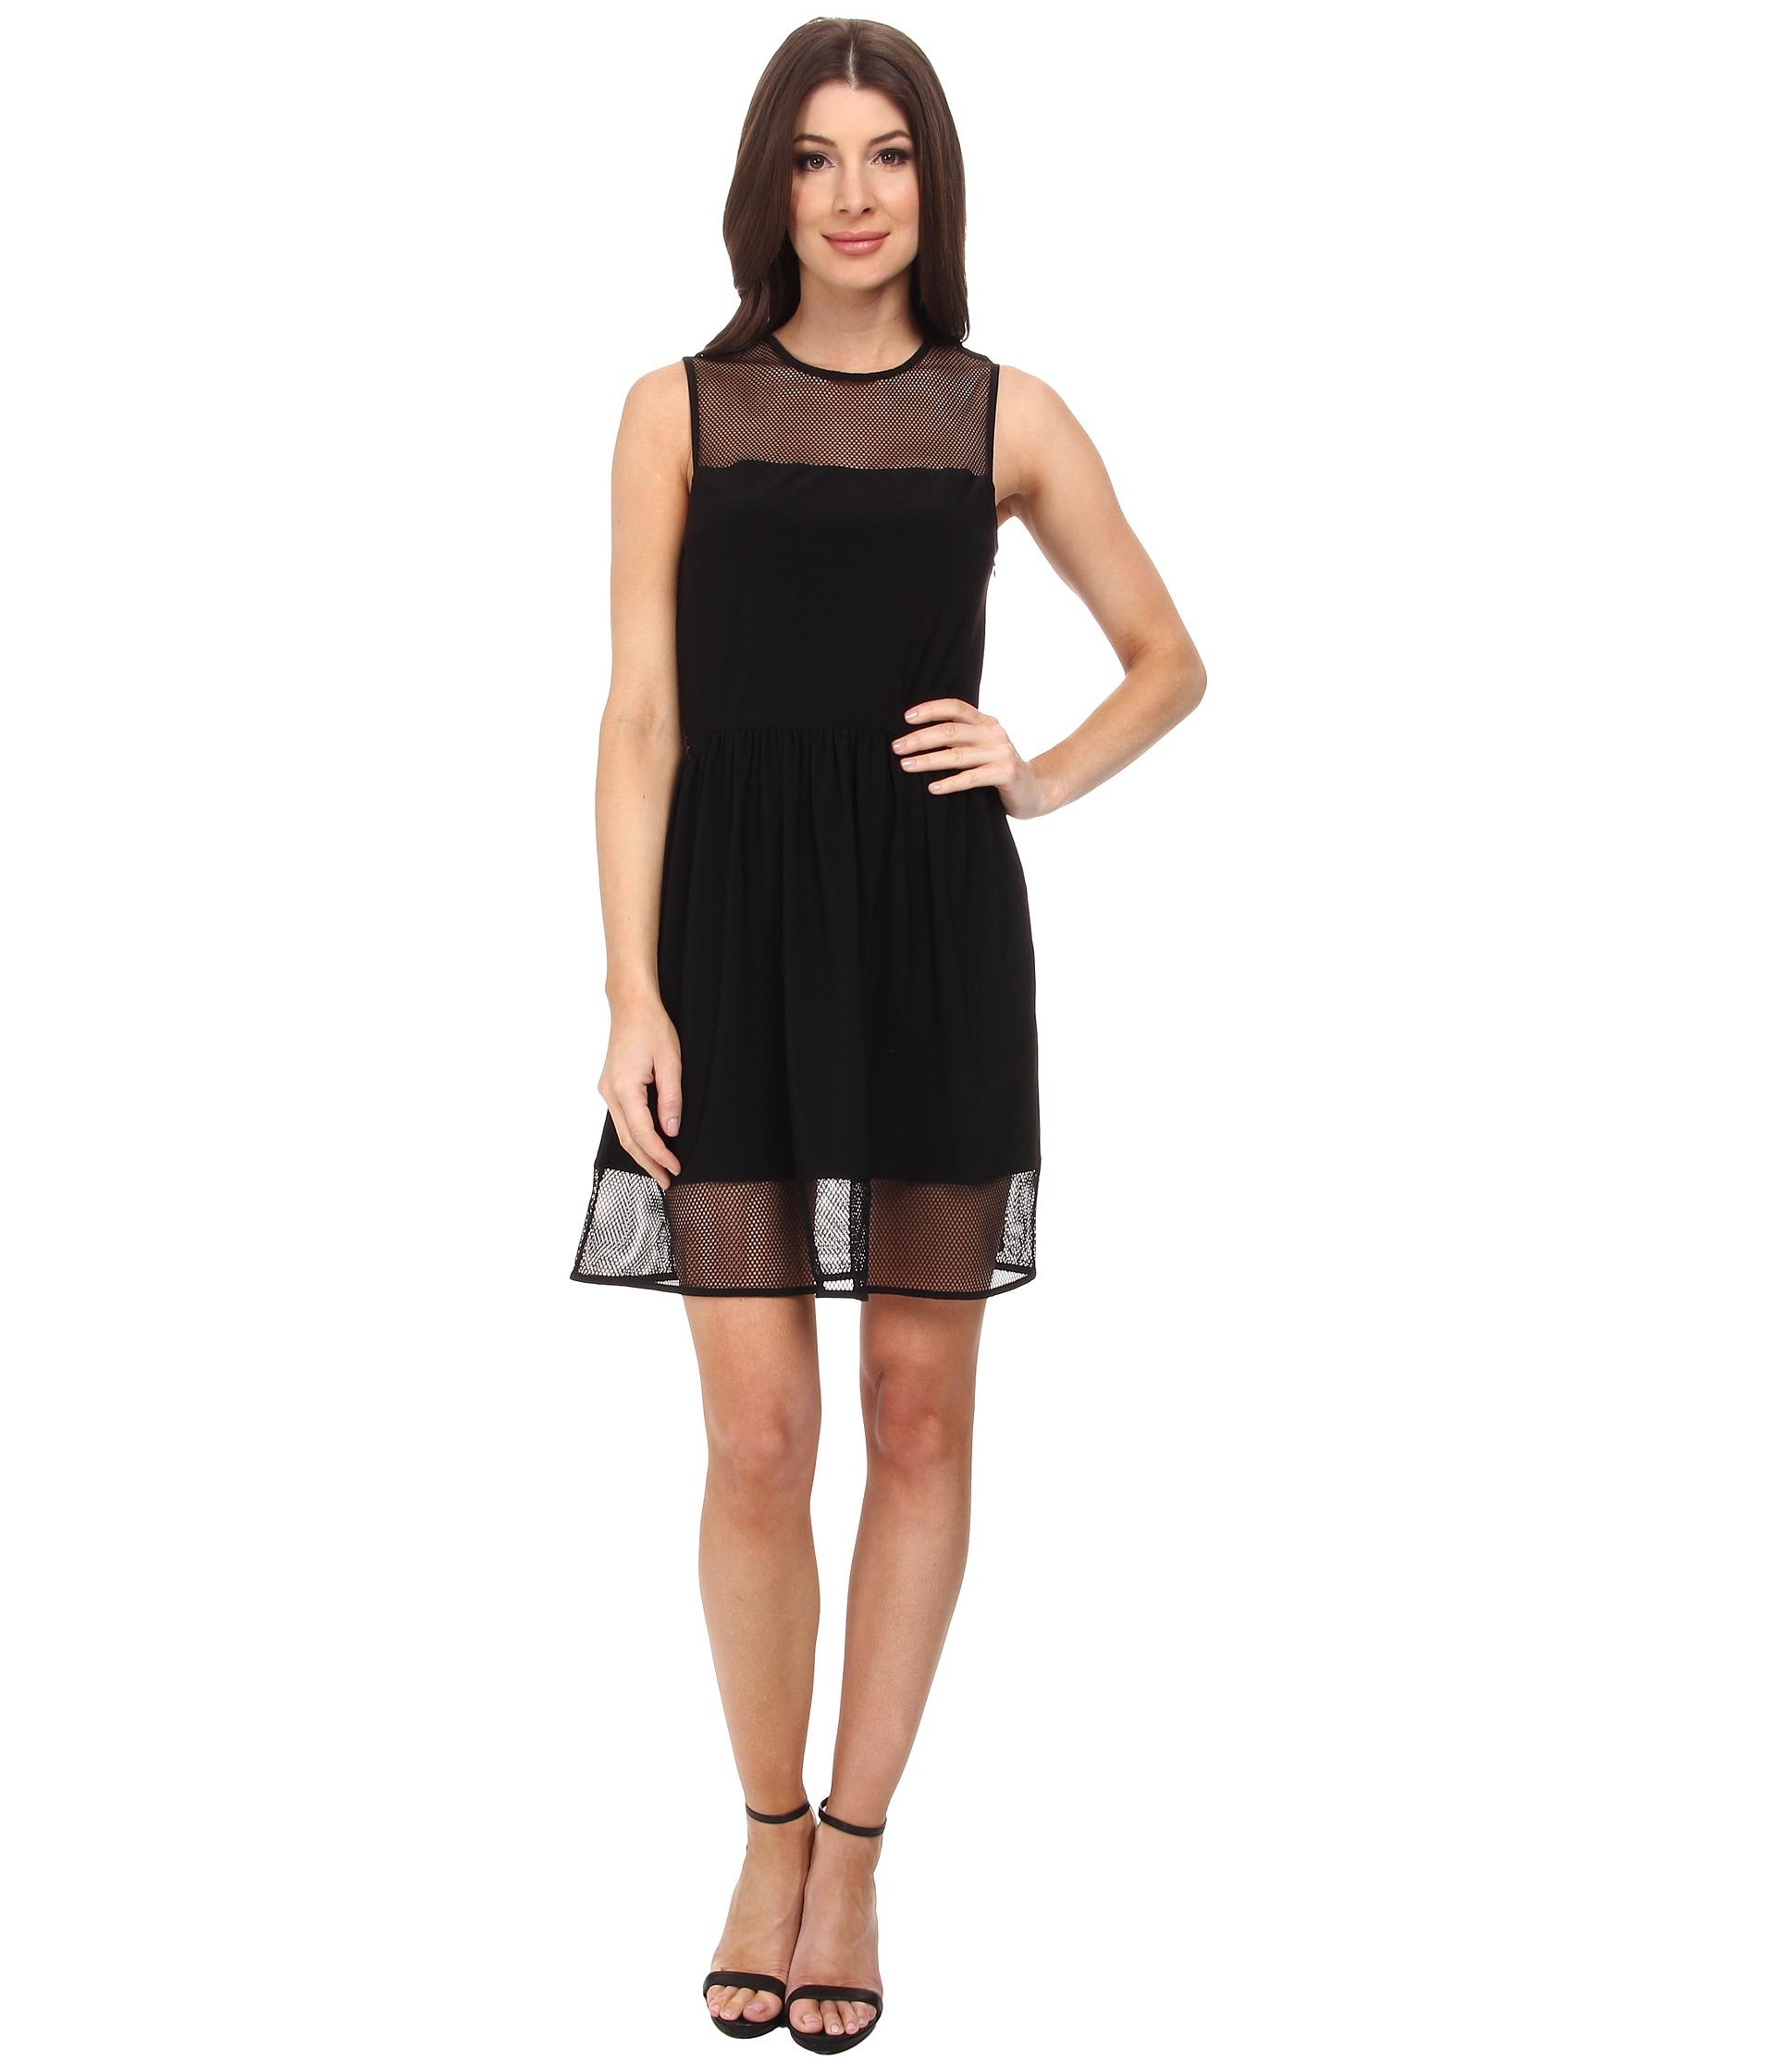 Lydia Dress in Blue Susana Monaco Cheap Sale Big Discount 1gecXq2Mja